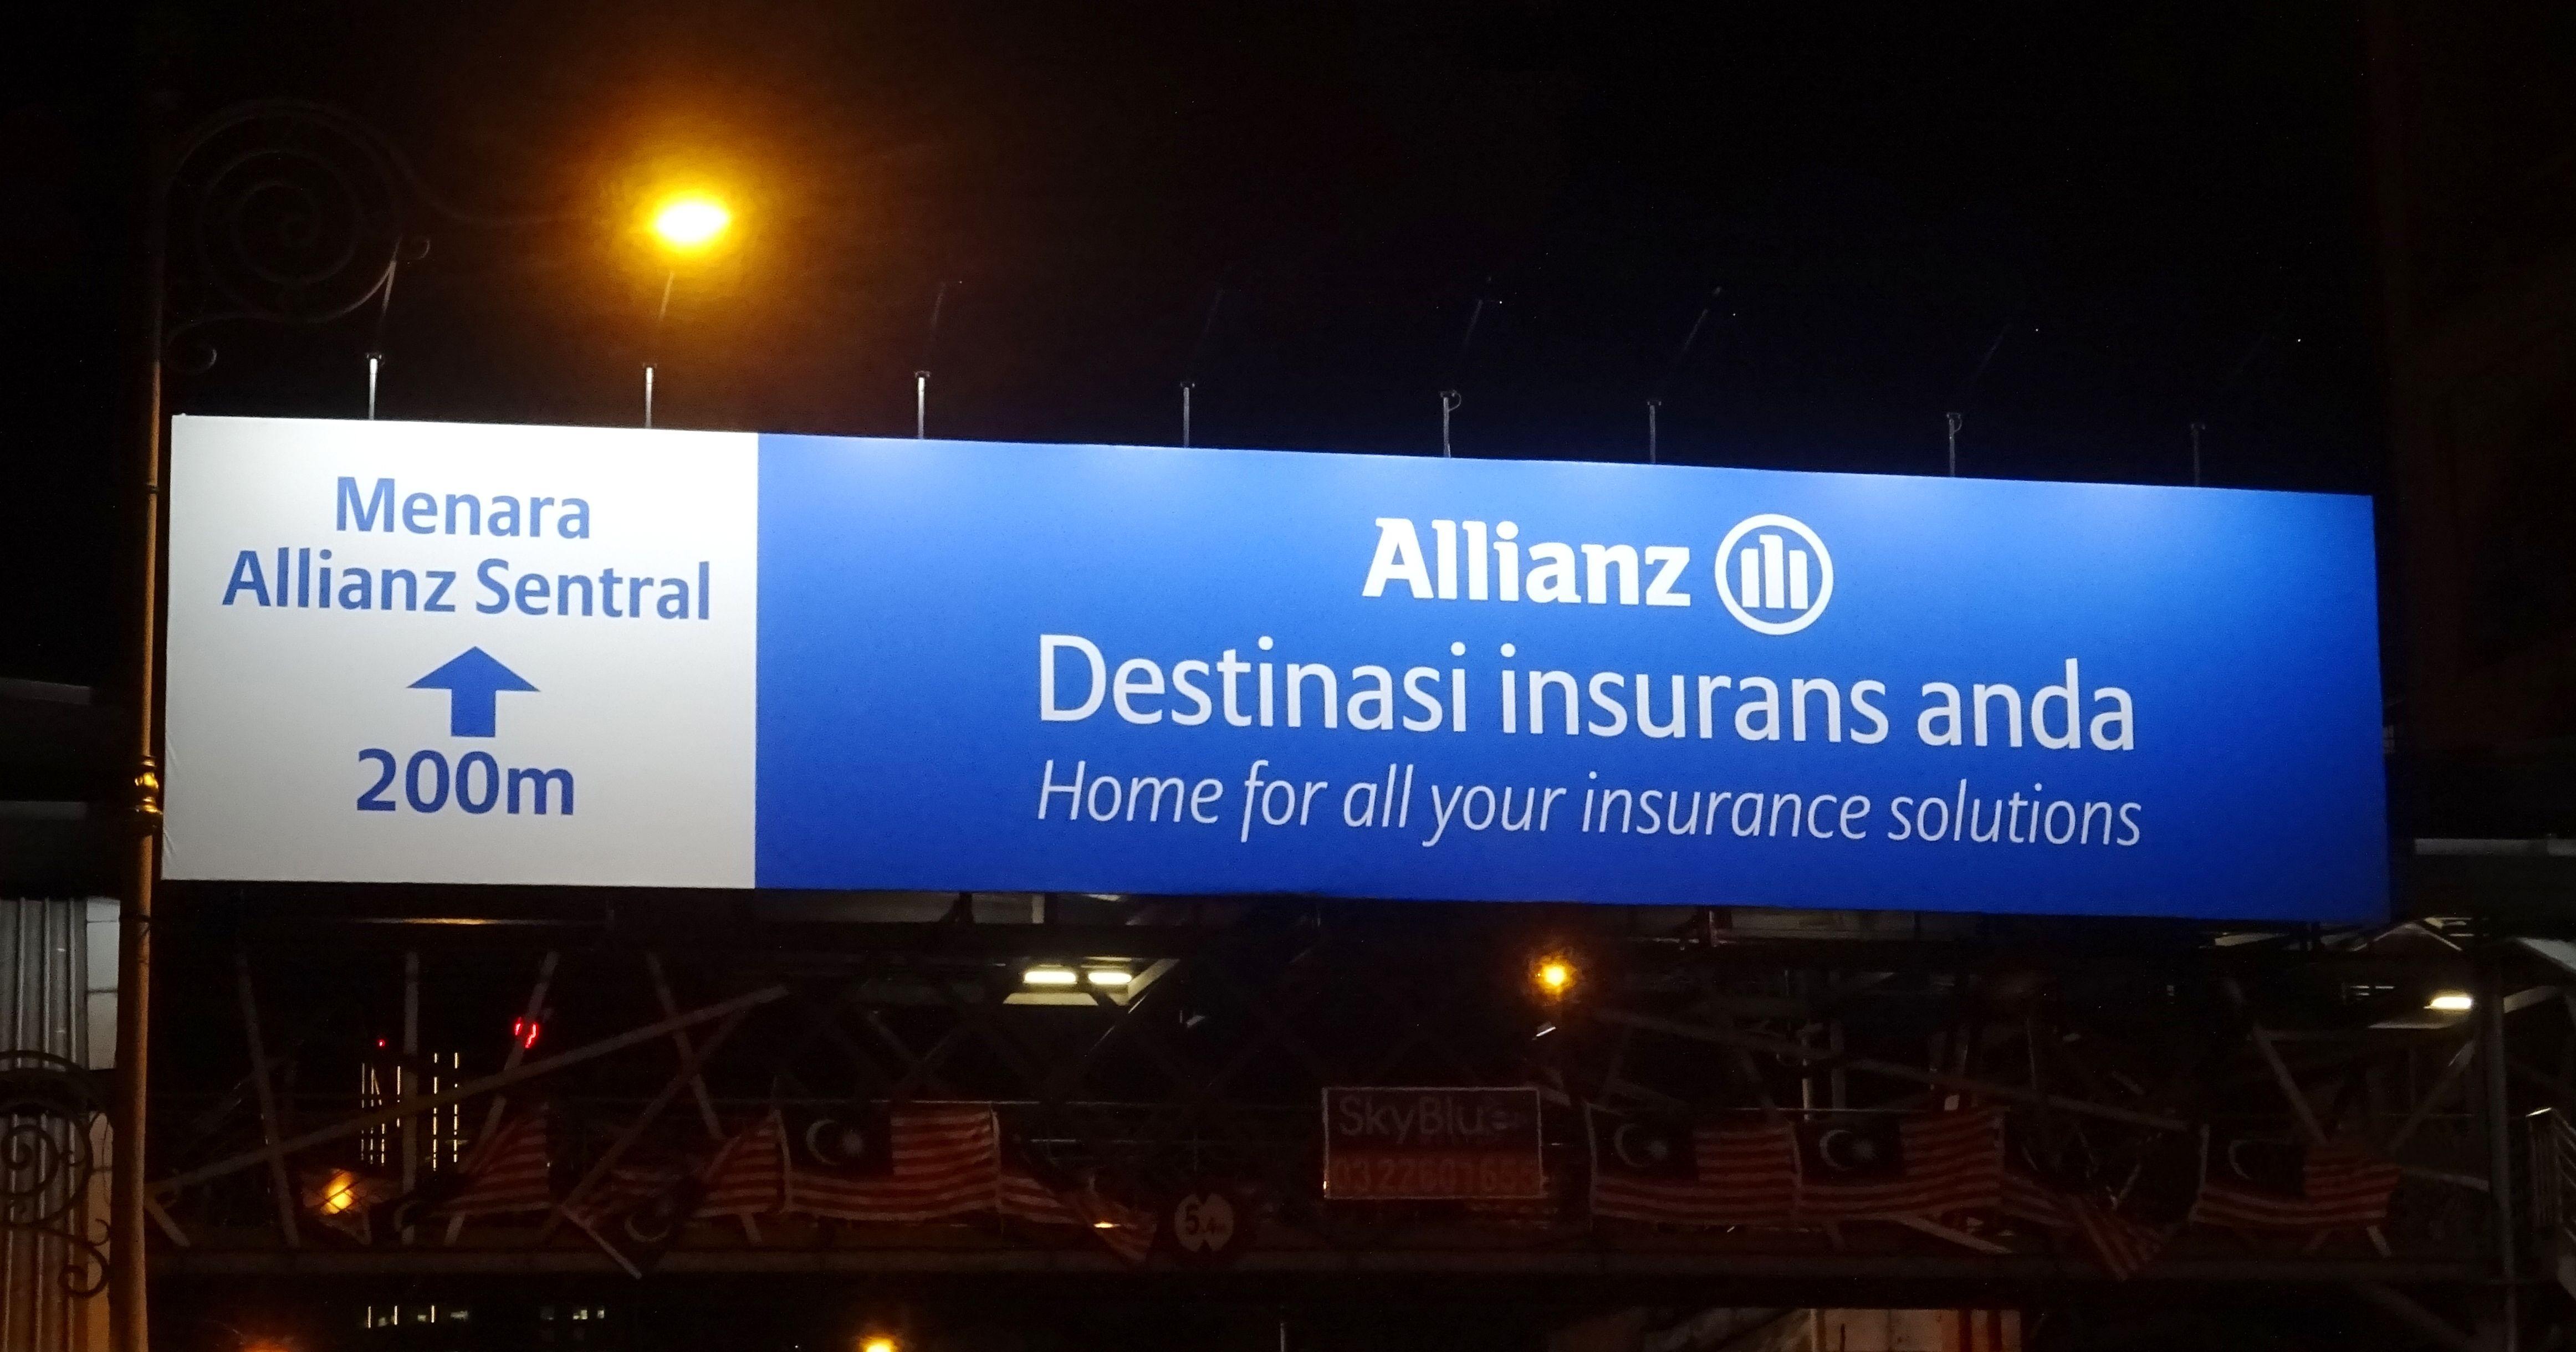 Skyview Unipole Pedestrian Bridge Billboard Advertisement